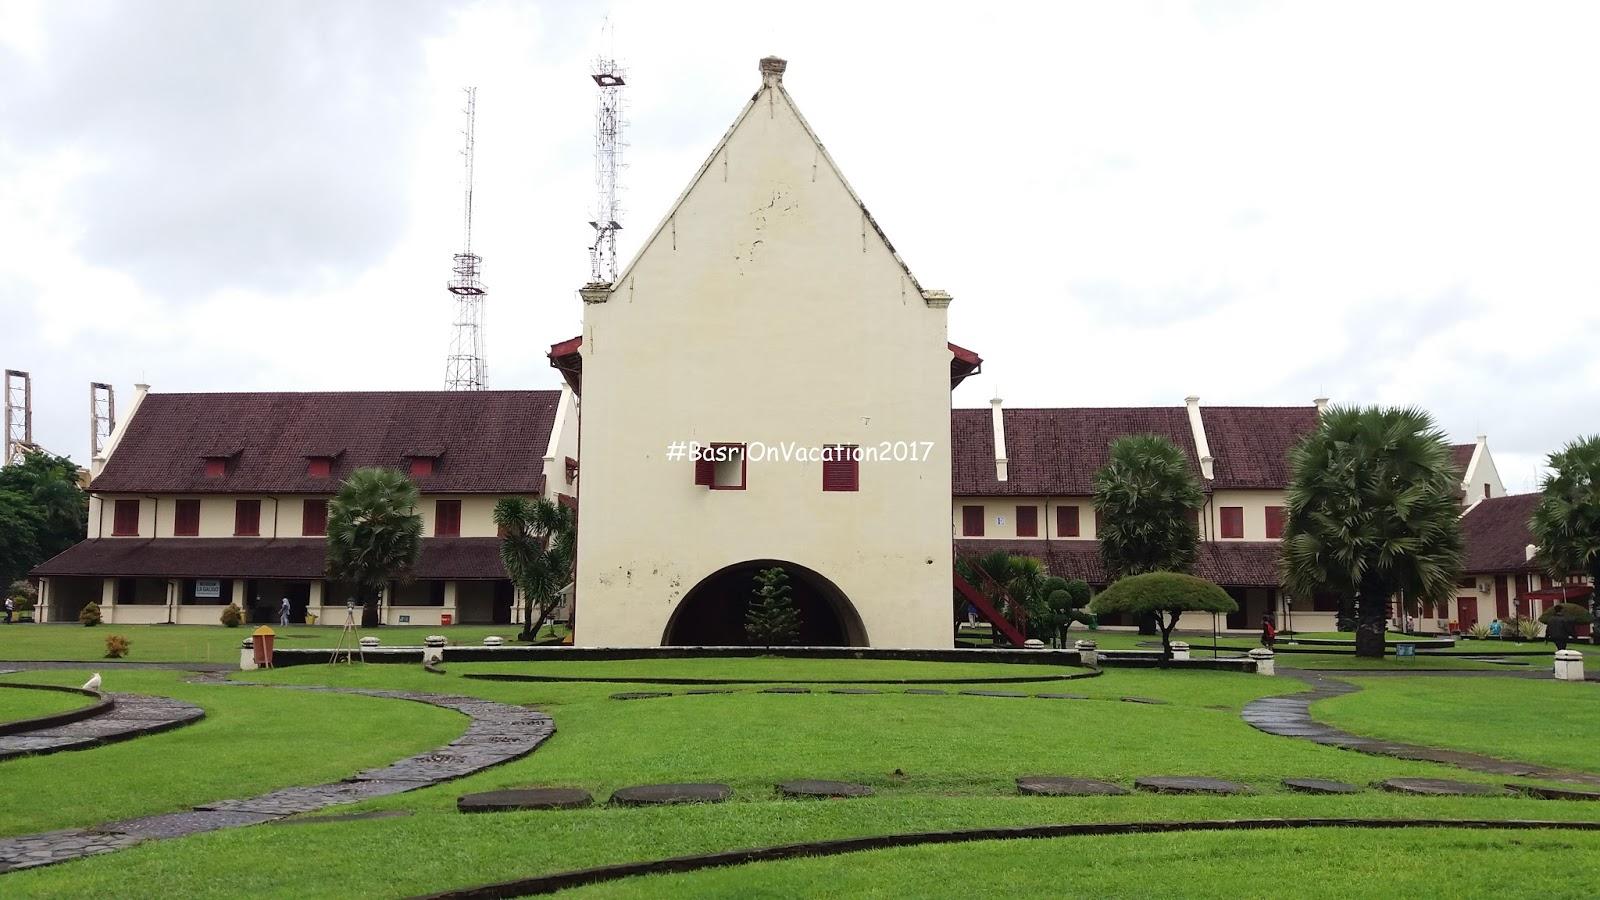 Coretan Waktu Kerja Wisata Sulawesi Selatan Fort Rotterdam Terletak Tidak